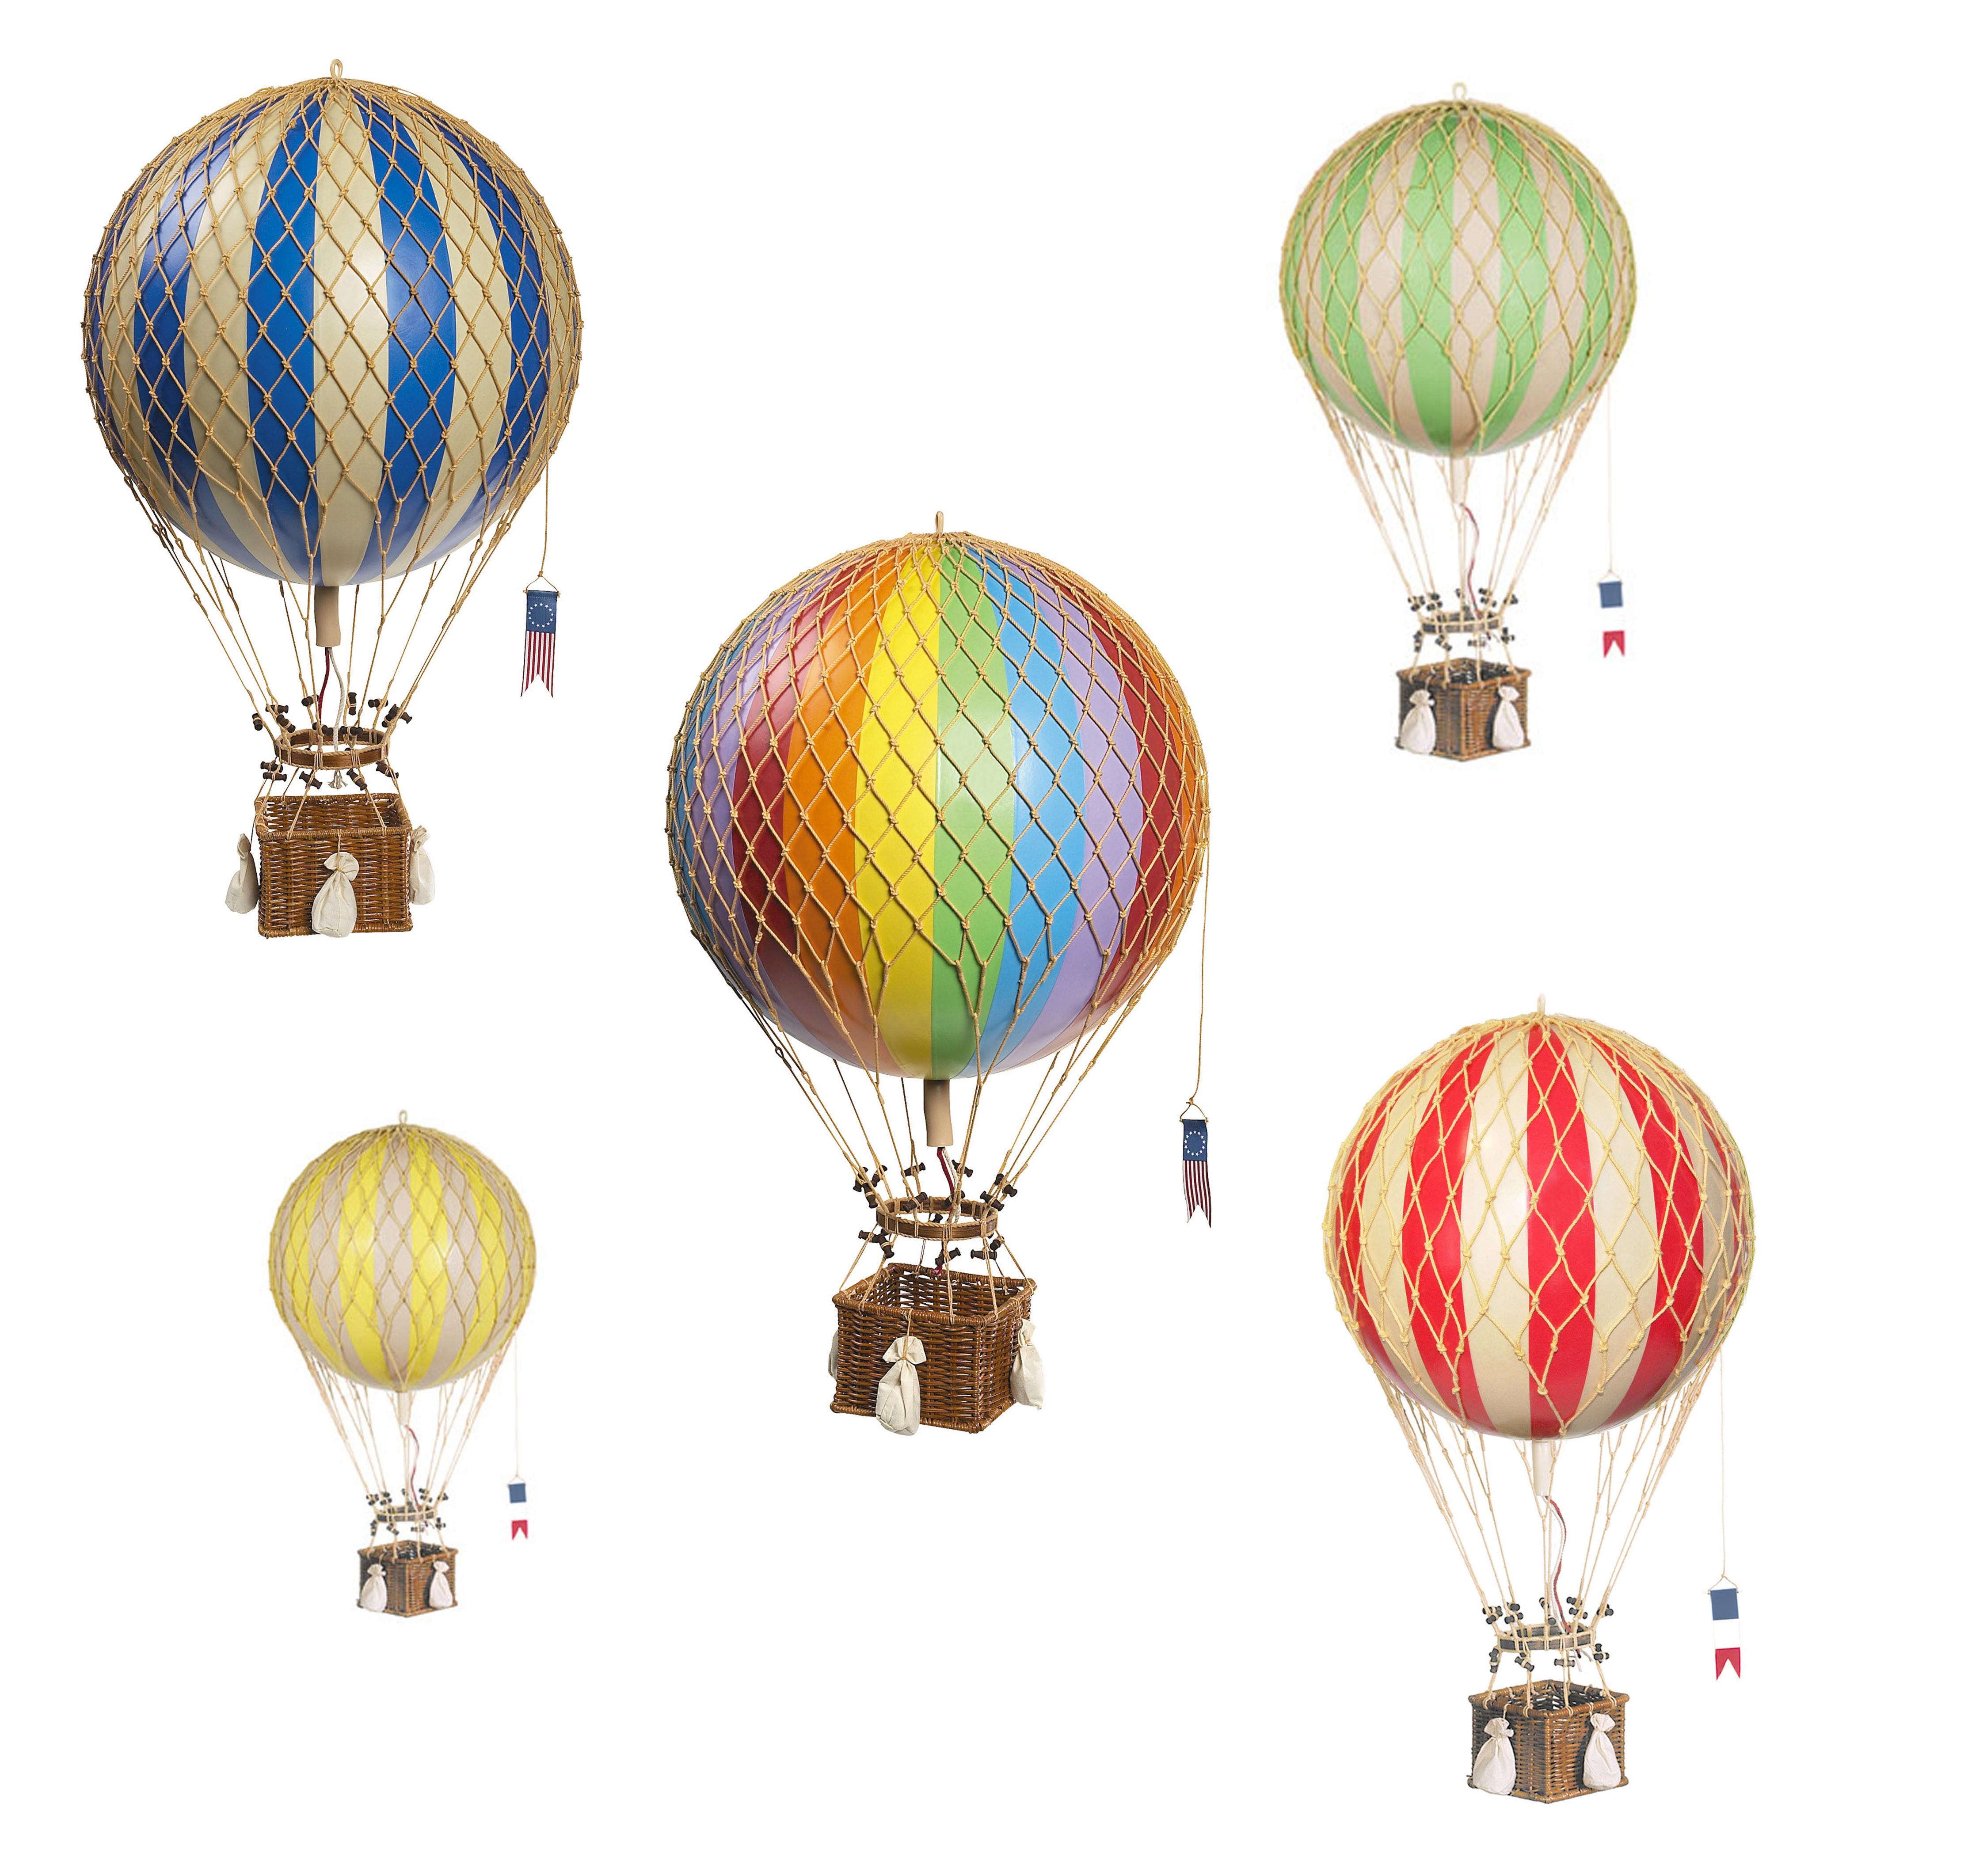 montgolfi re 32 cm shop latitude deco